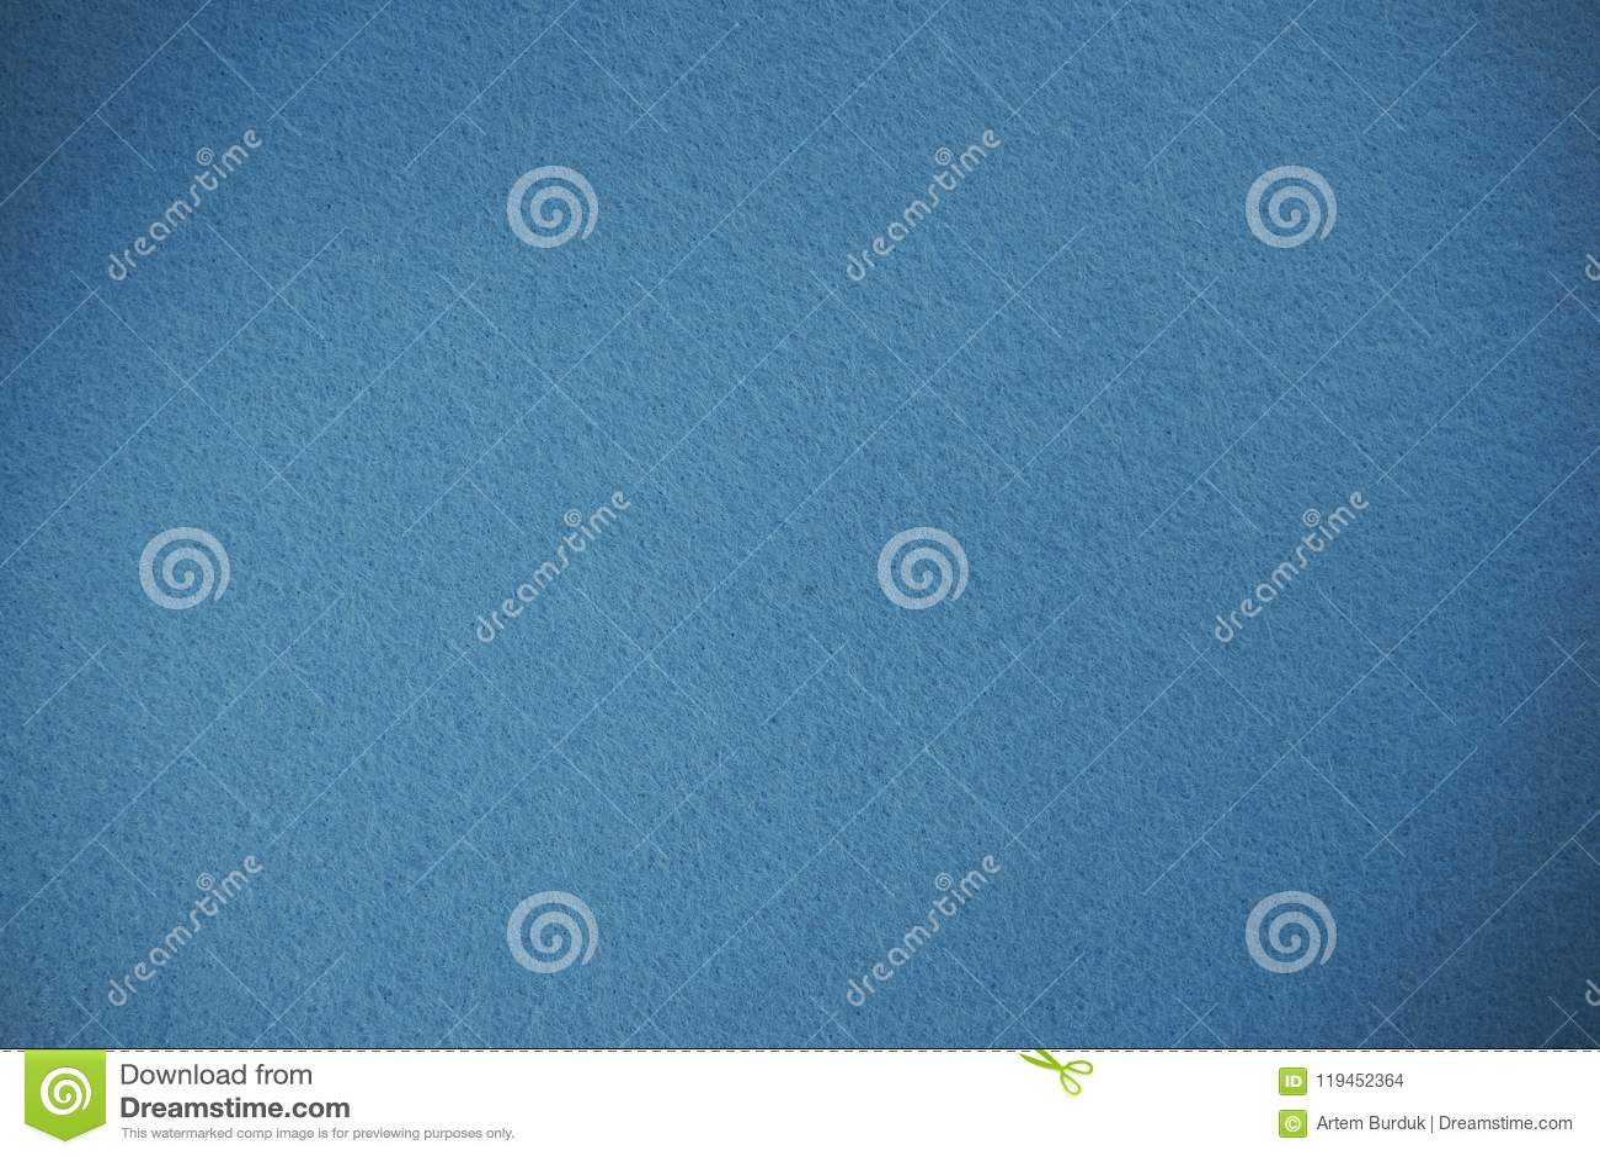 Light blue felt texture background